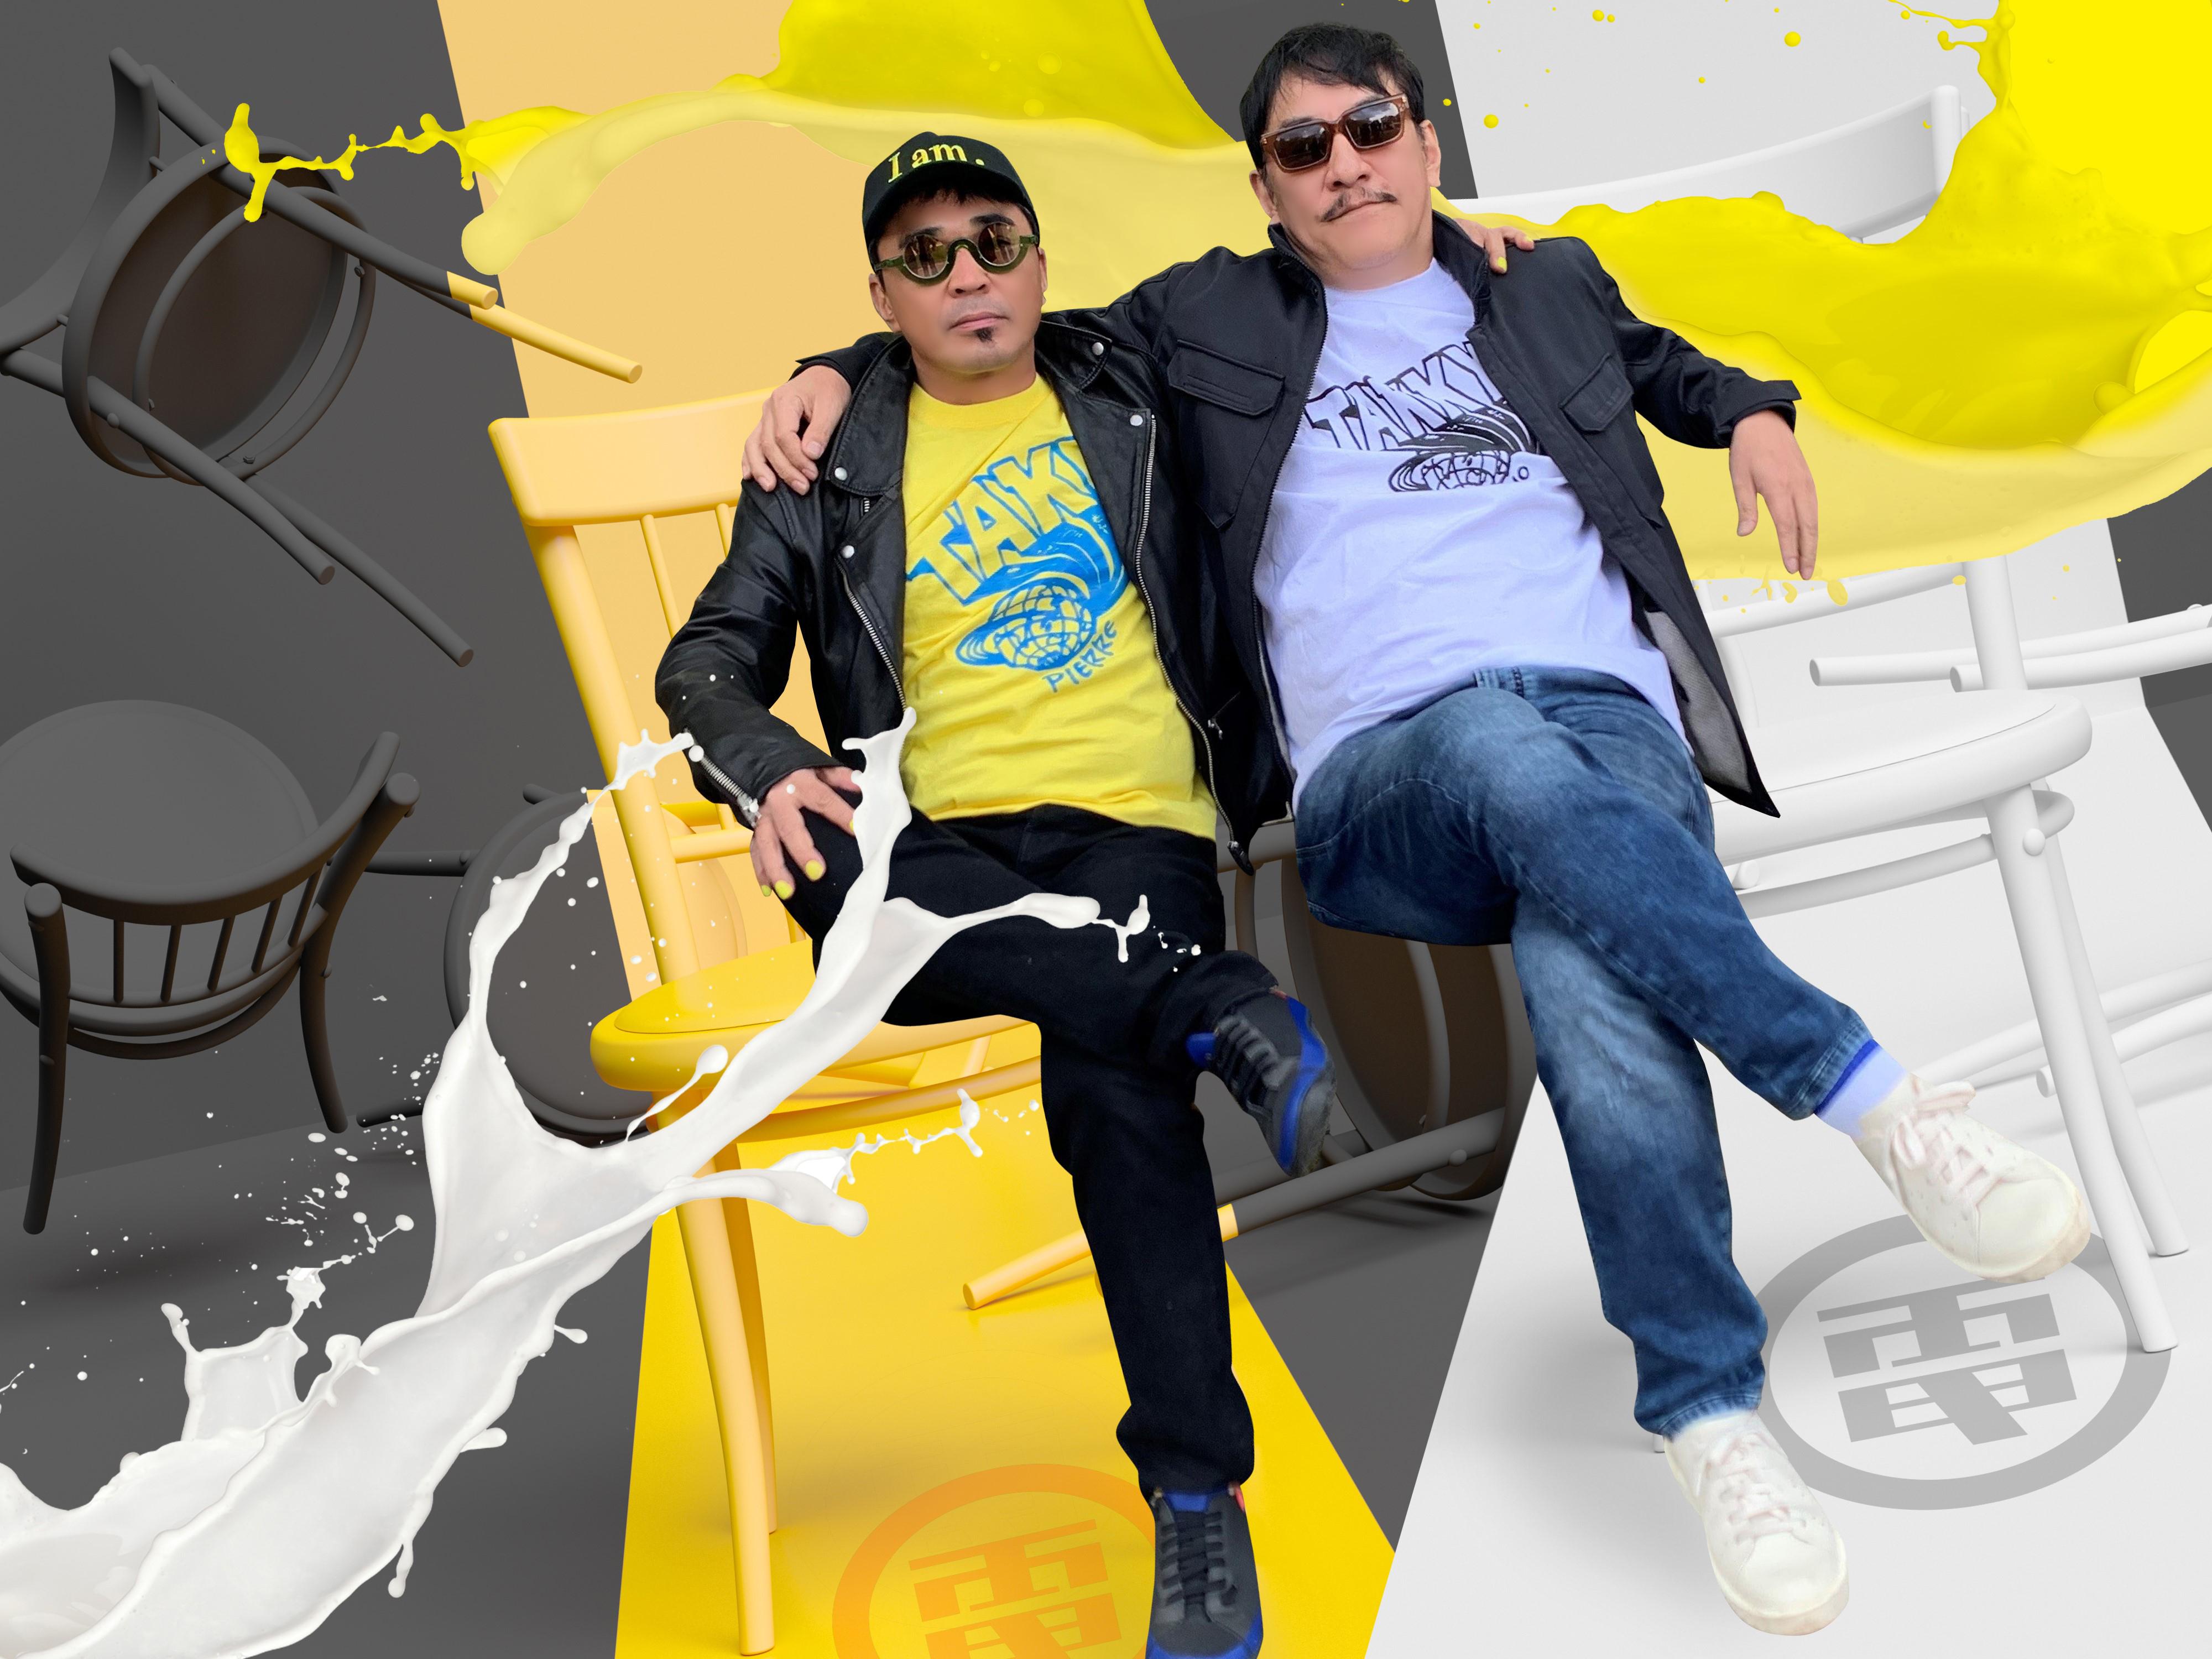 denki_groove FRF'20 LIVE ON YOUTUBE配信直前!見所&過去ライブ振り返りまとめ | 津田昌太朗